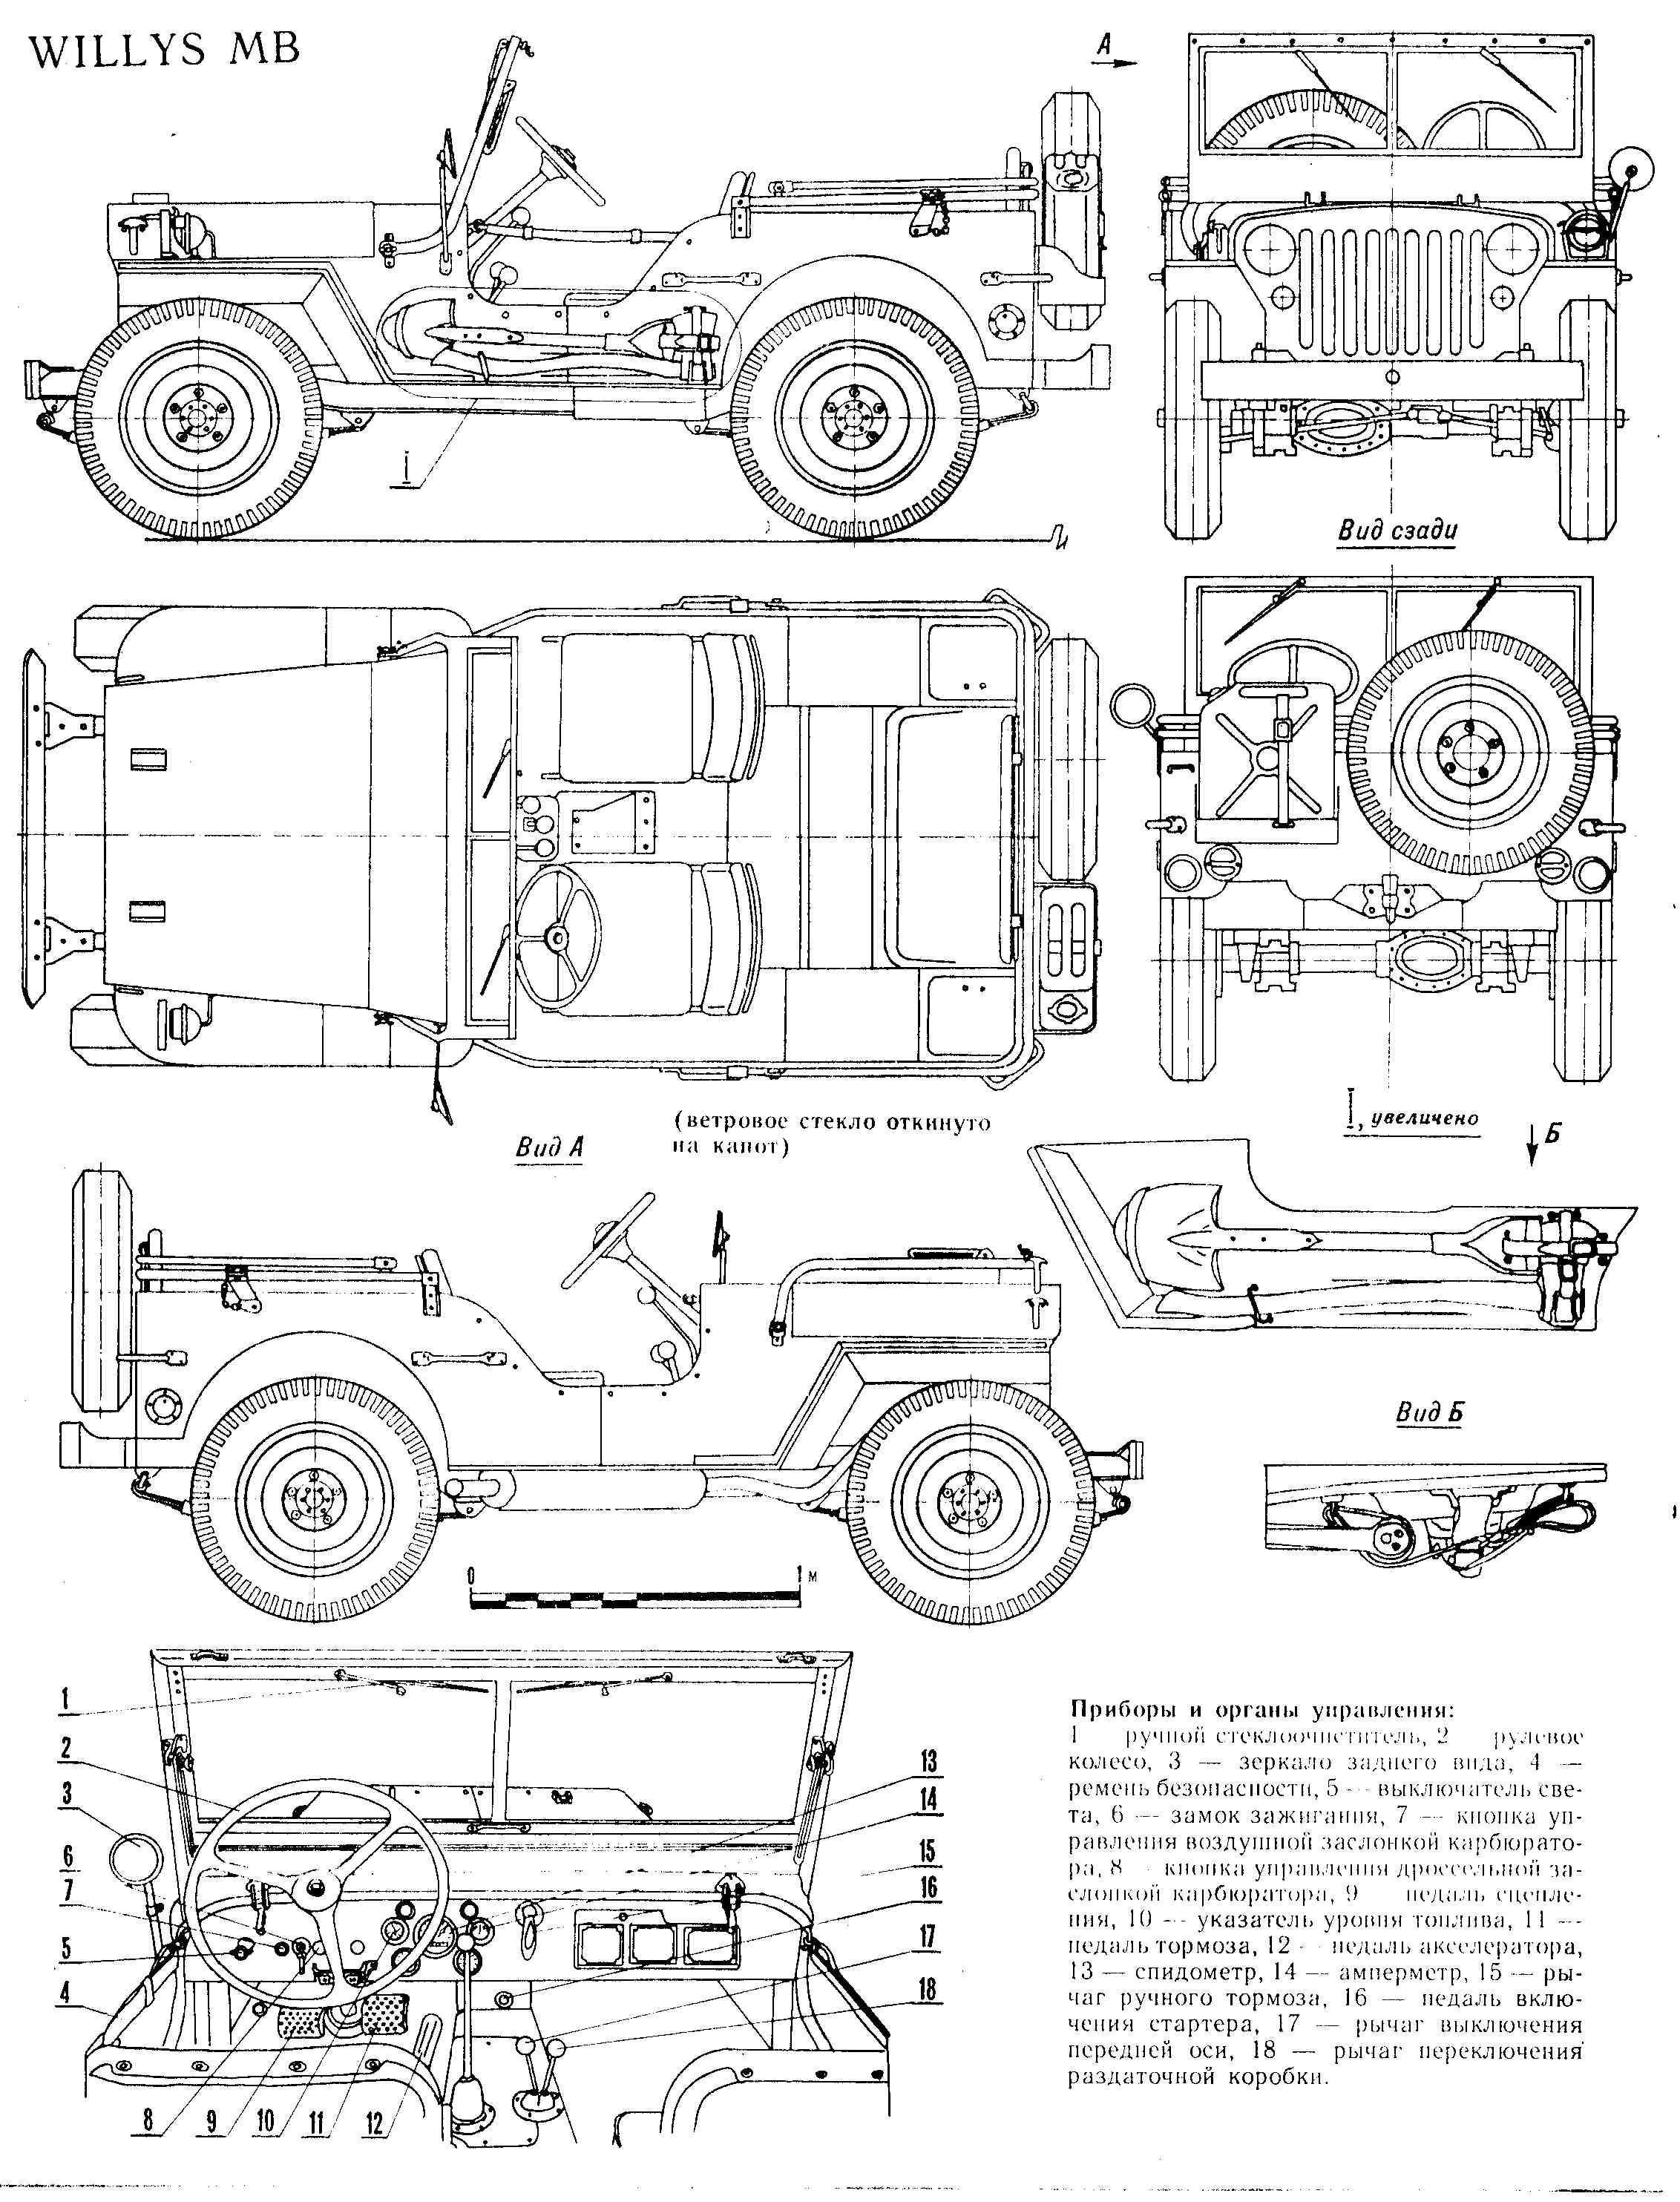 jeep willys mb 1941 45 1 jpg 130087 2264×2967 jeeps jeep willys mb 1941 45 1 jpg 130087